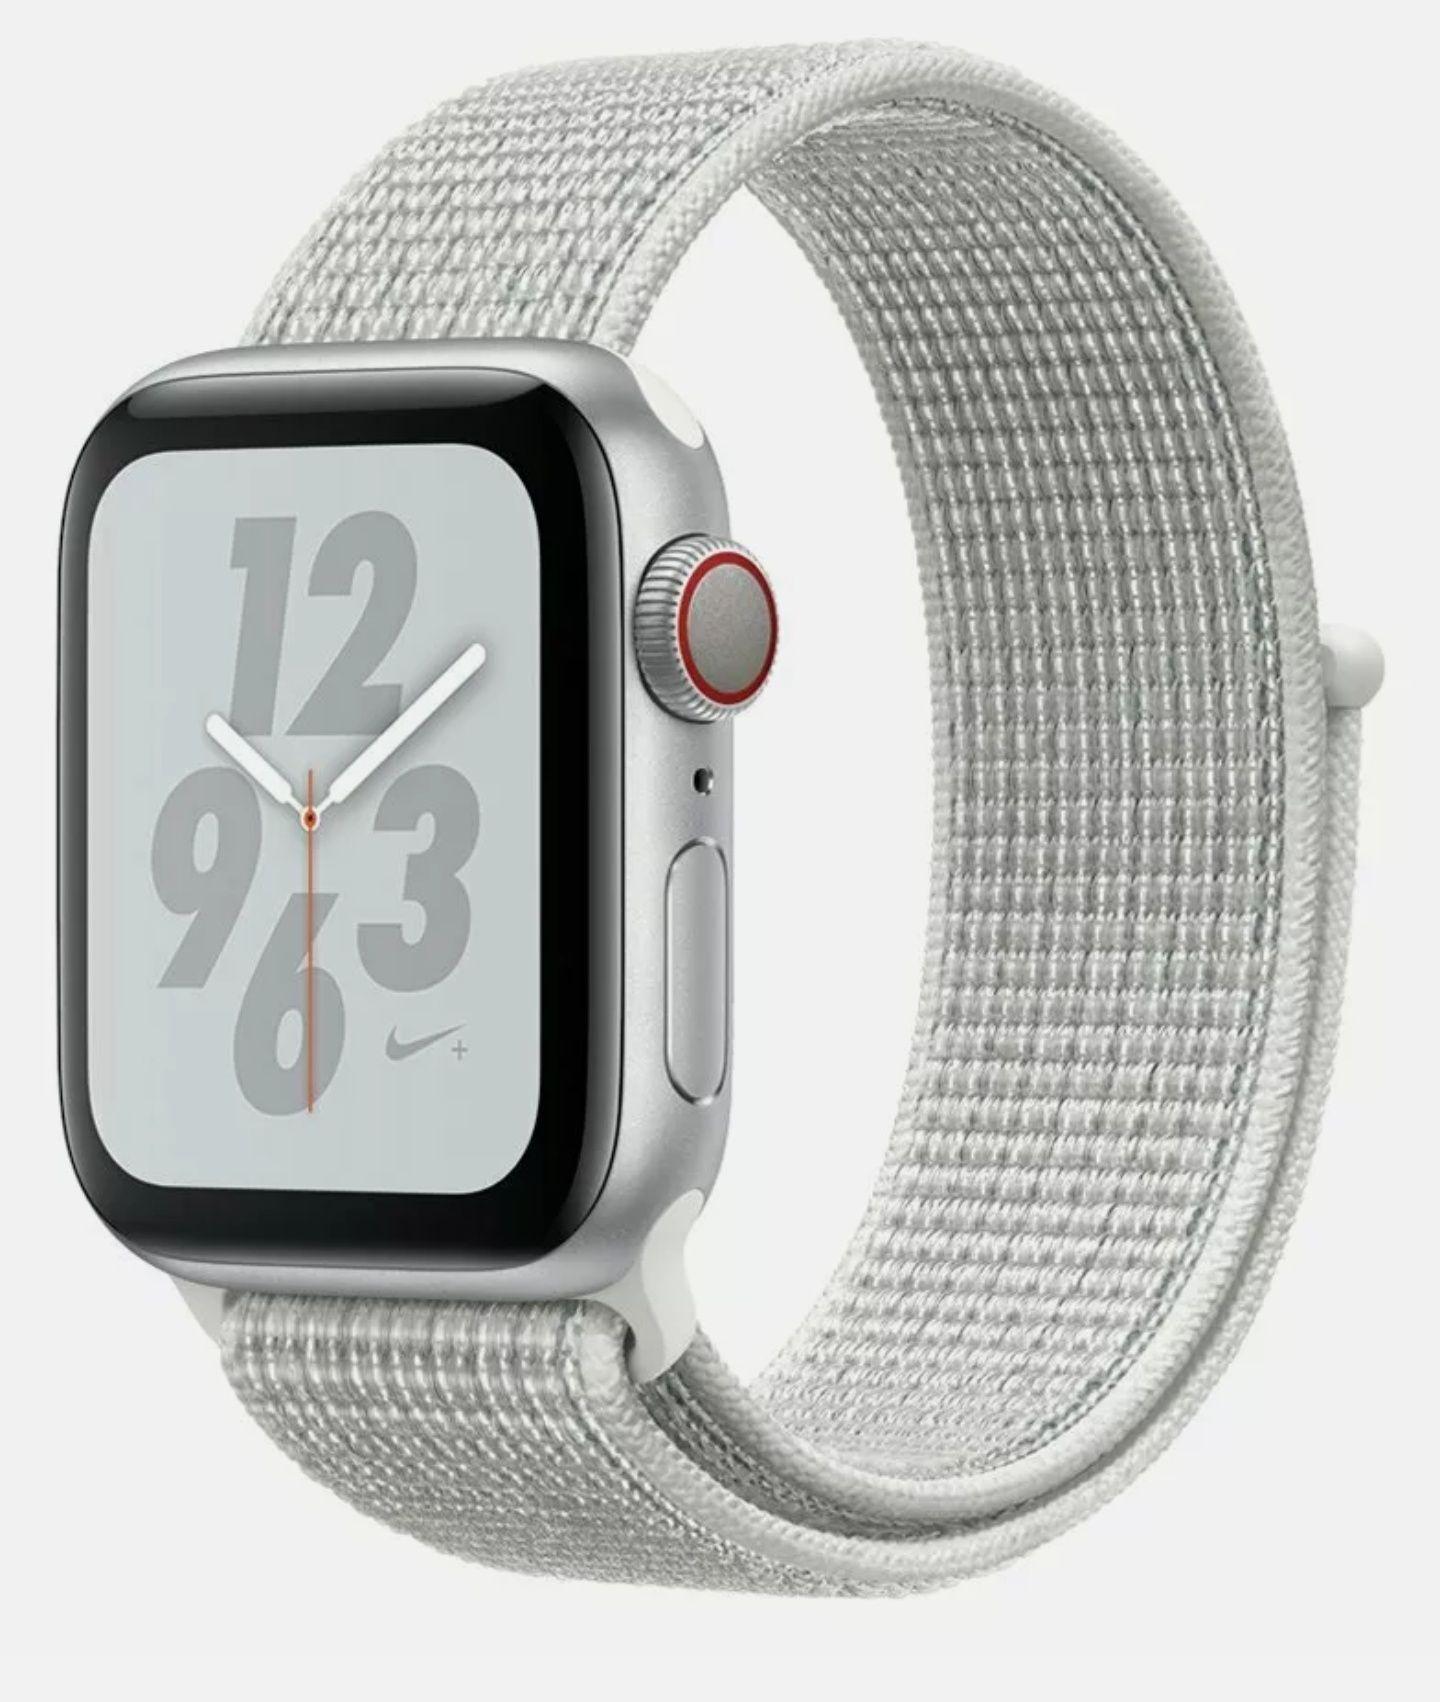 Apple Watch S4 Nike 40mm WiFi & Cellular Smart Watch - Silver & White Band - £231.99 @ Argos / Ebay